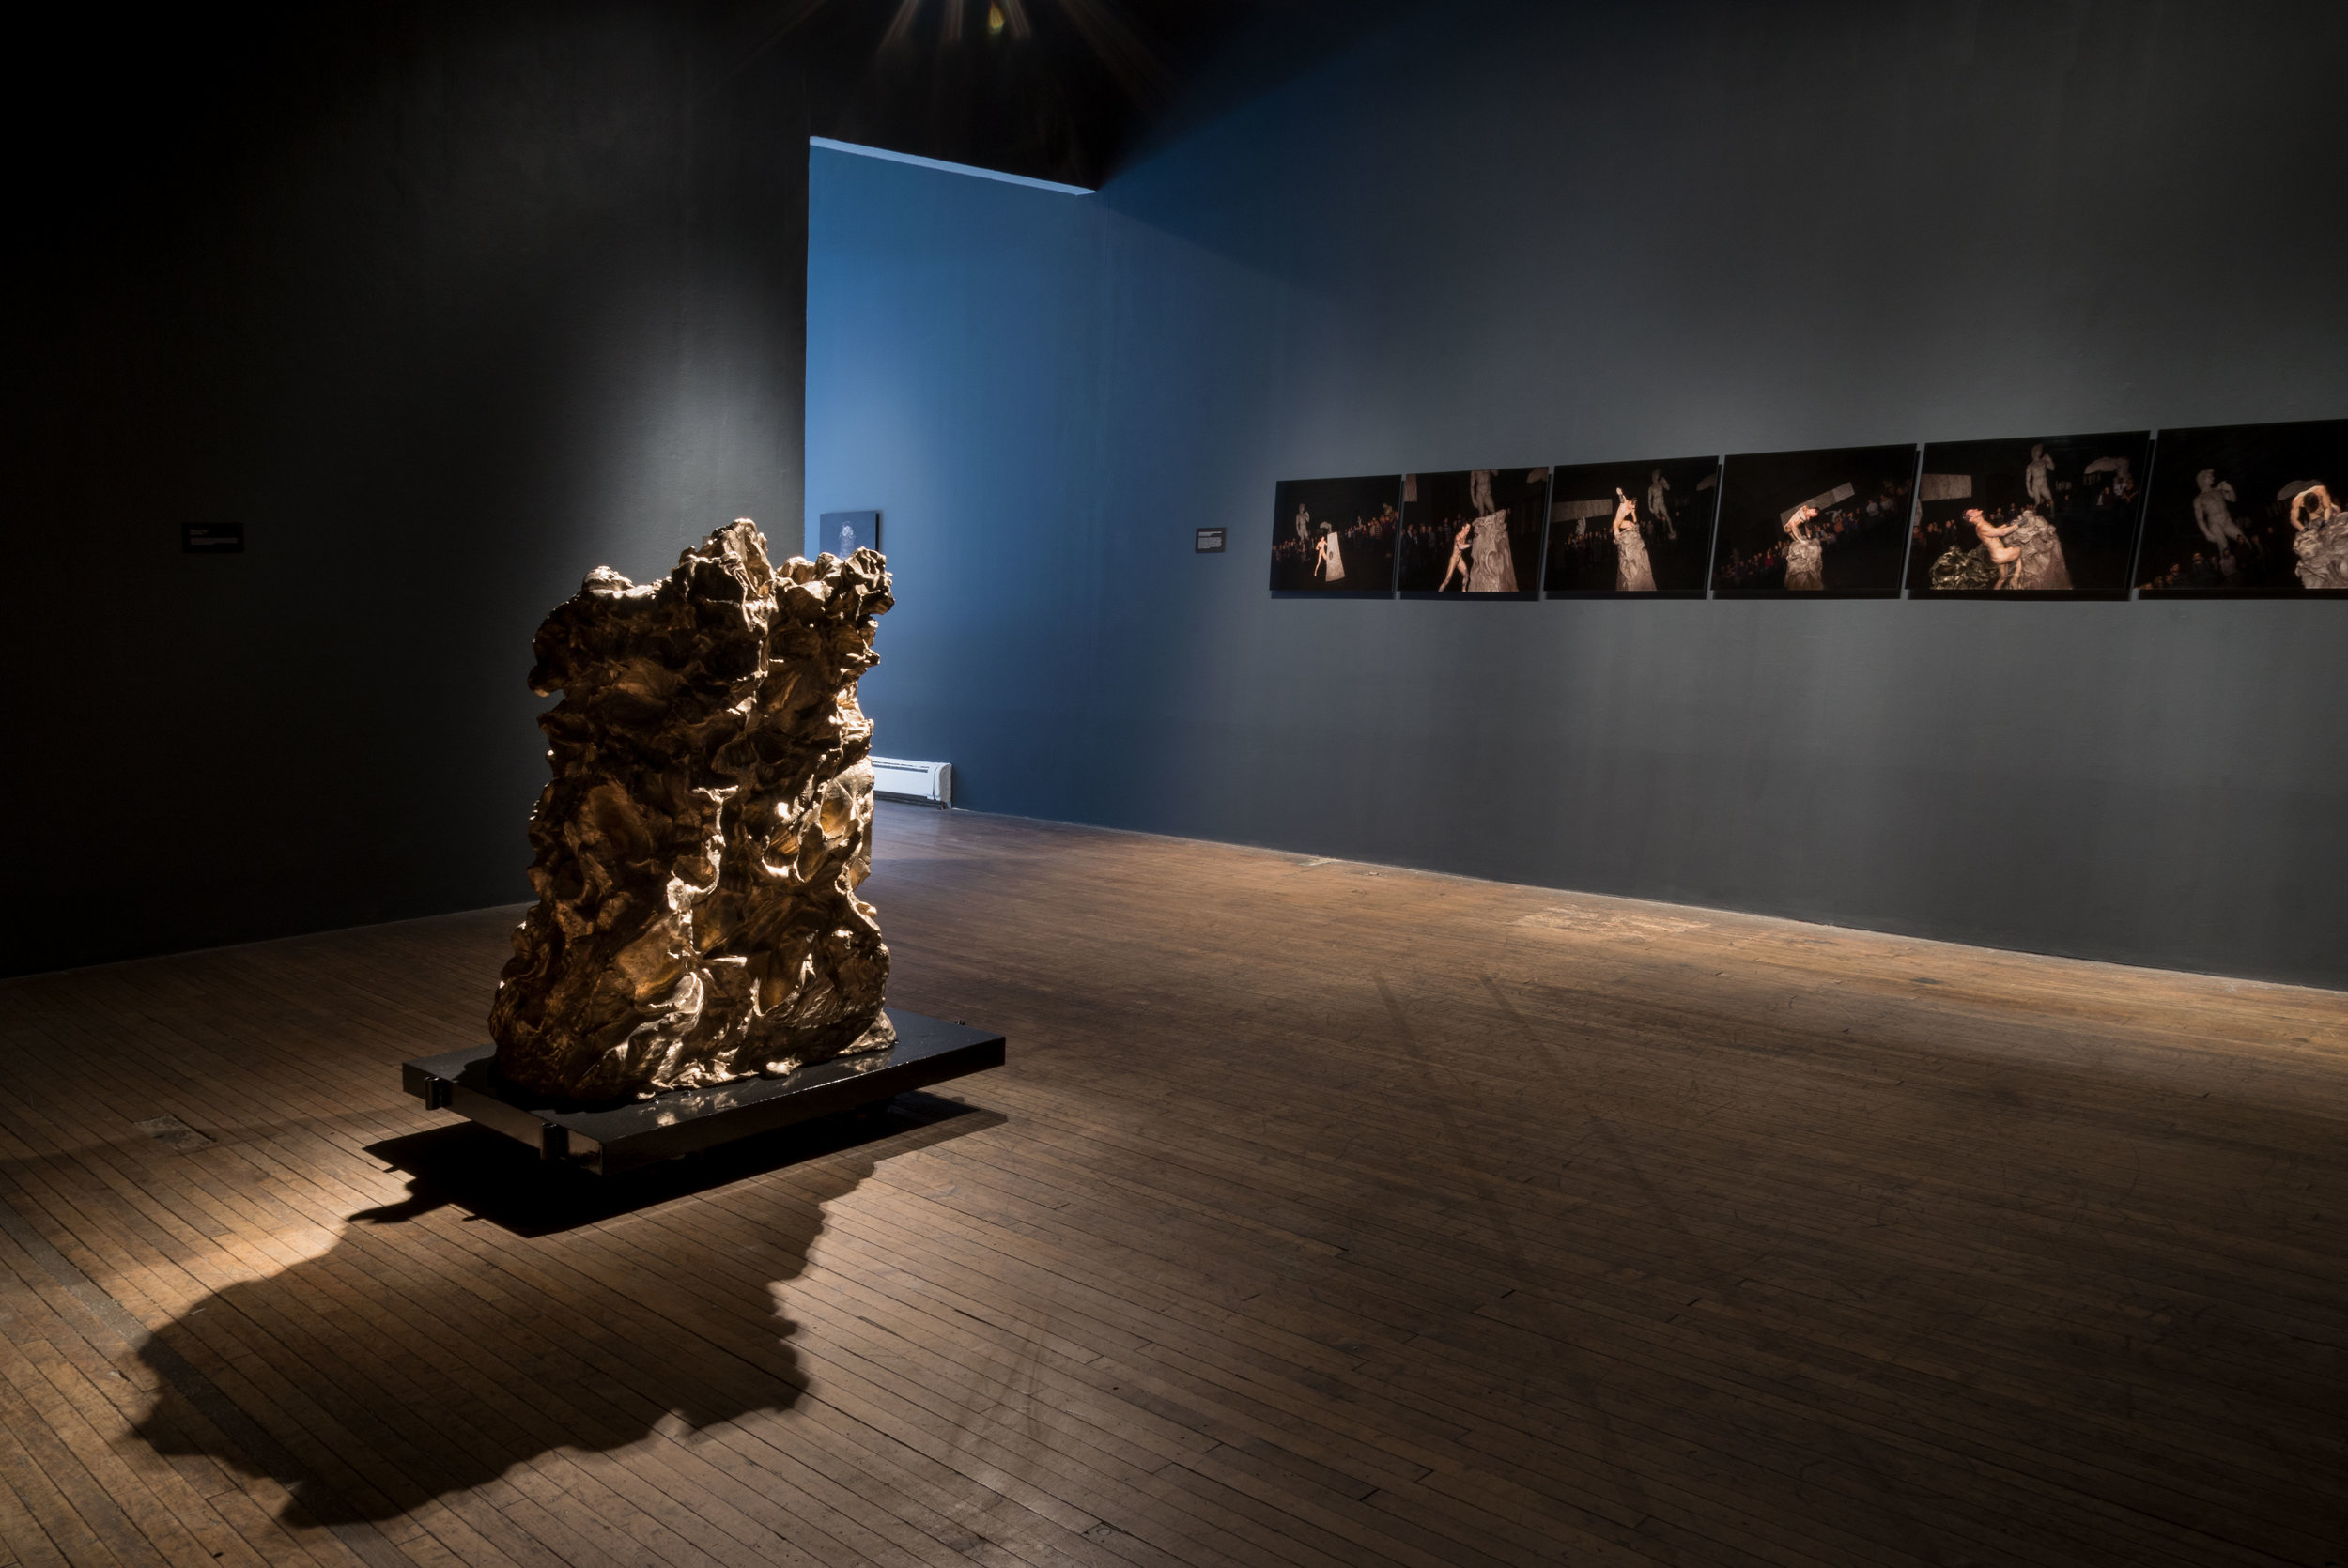 "CASSILS. INSTALLATION VIEW ""MONUMENTAL"" (2017). COURTESY THE ARTIST AND RONALD FELDMAN GALLERY, NEW YORK. PHOTO MEGAN PAETZHOLD."